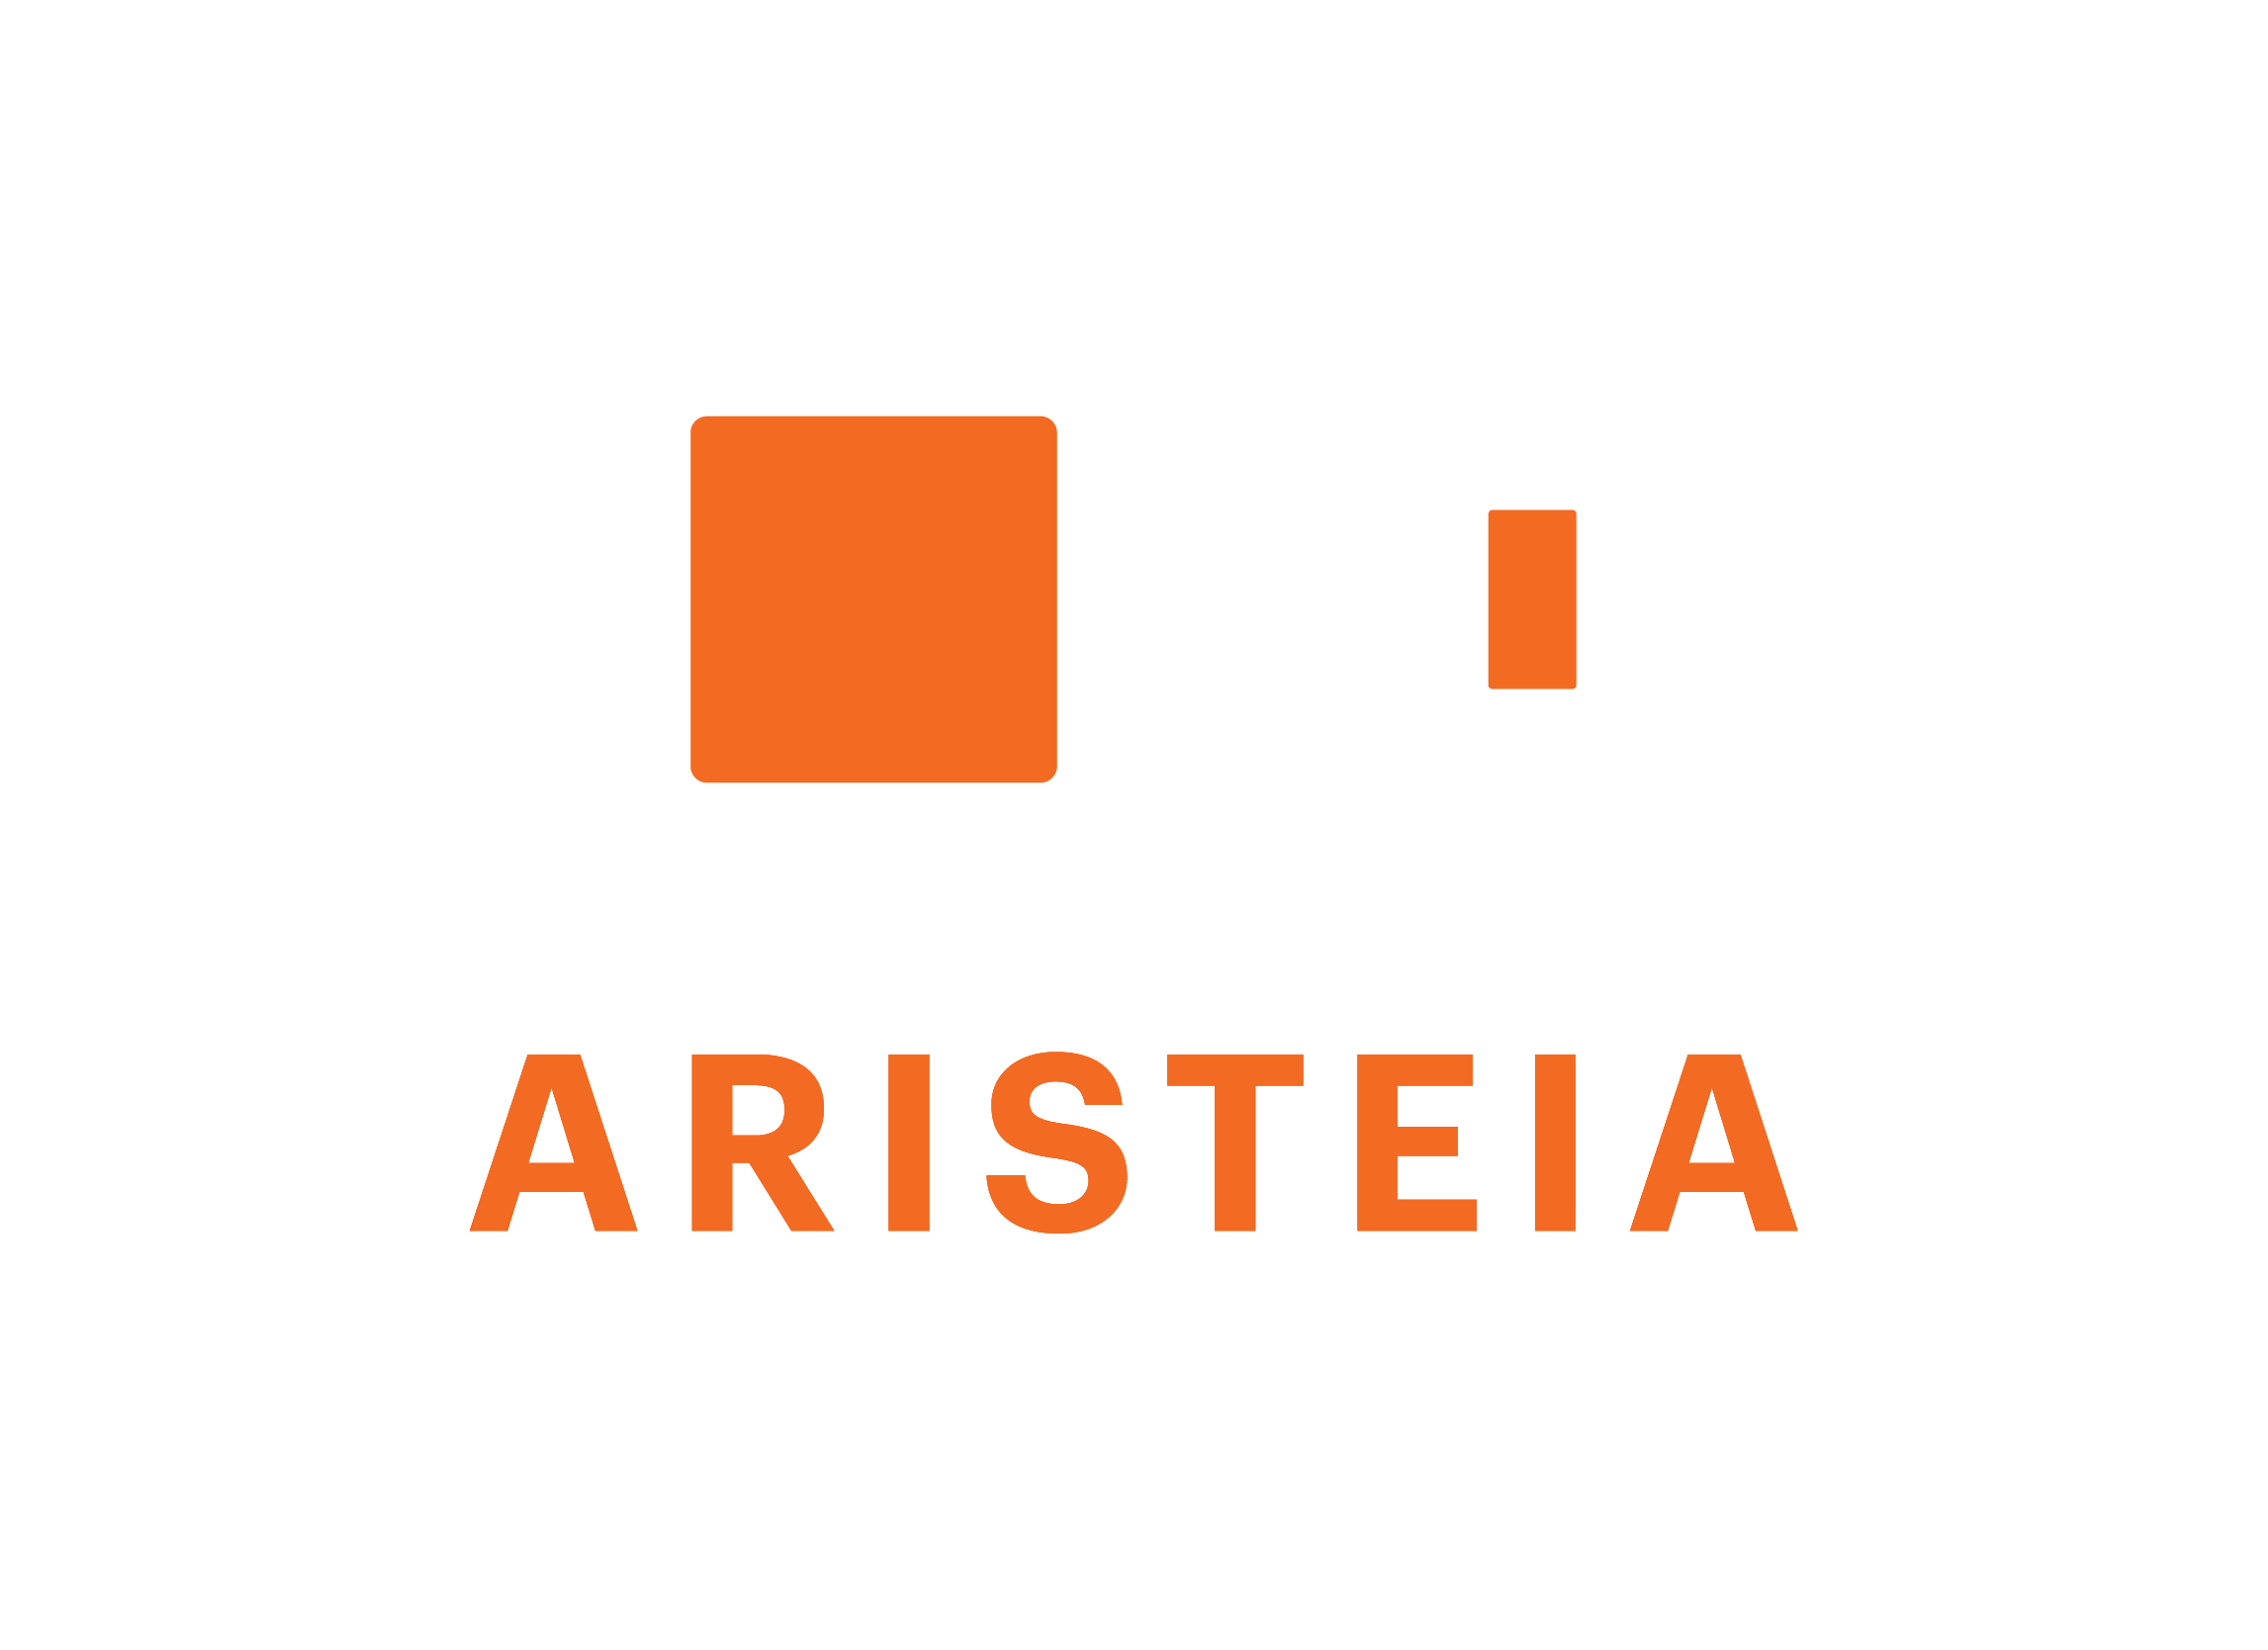 aristeia – Kopi – Kopi.png